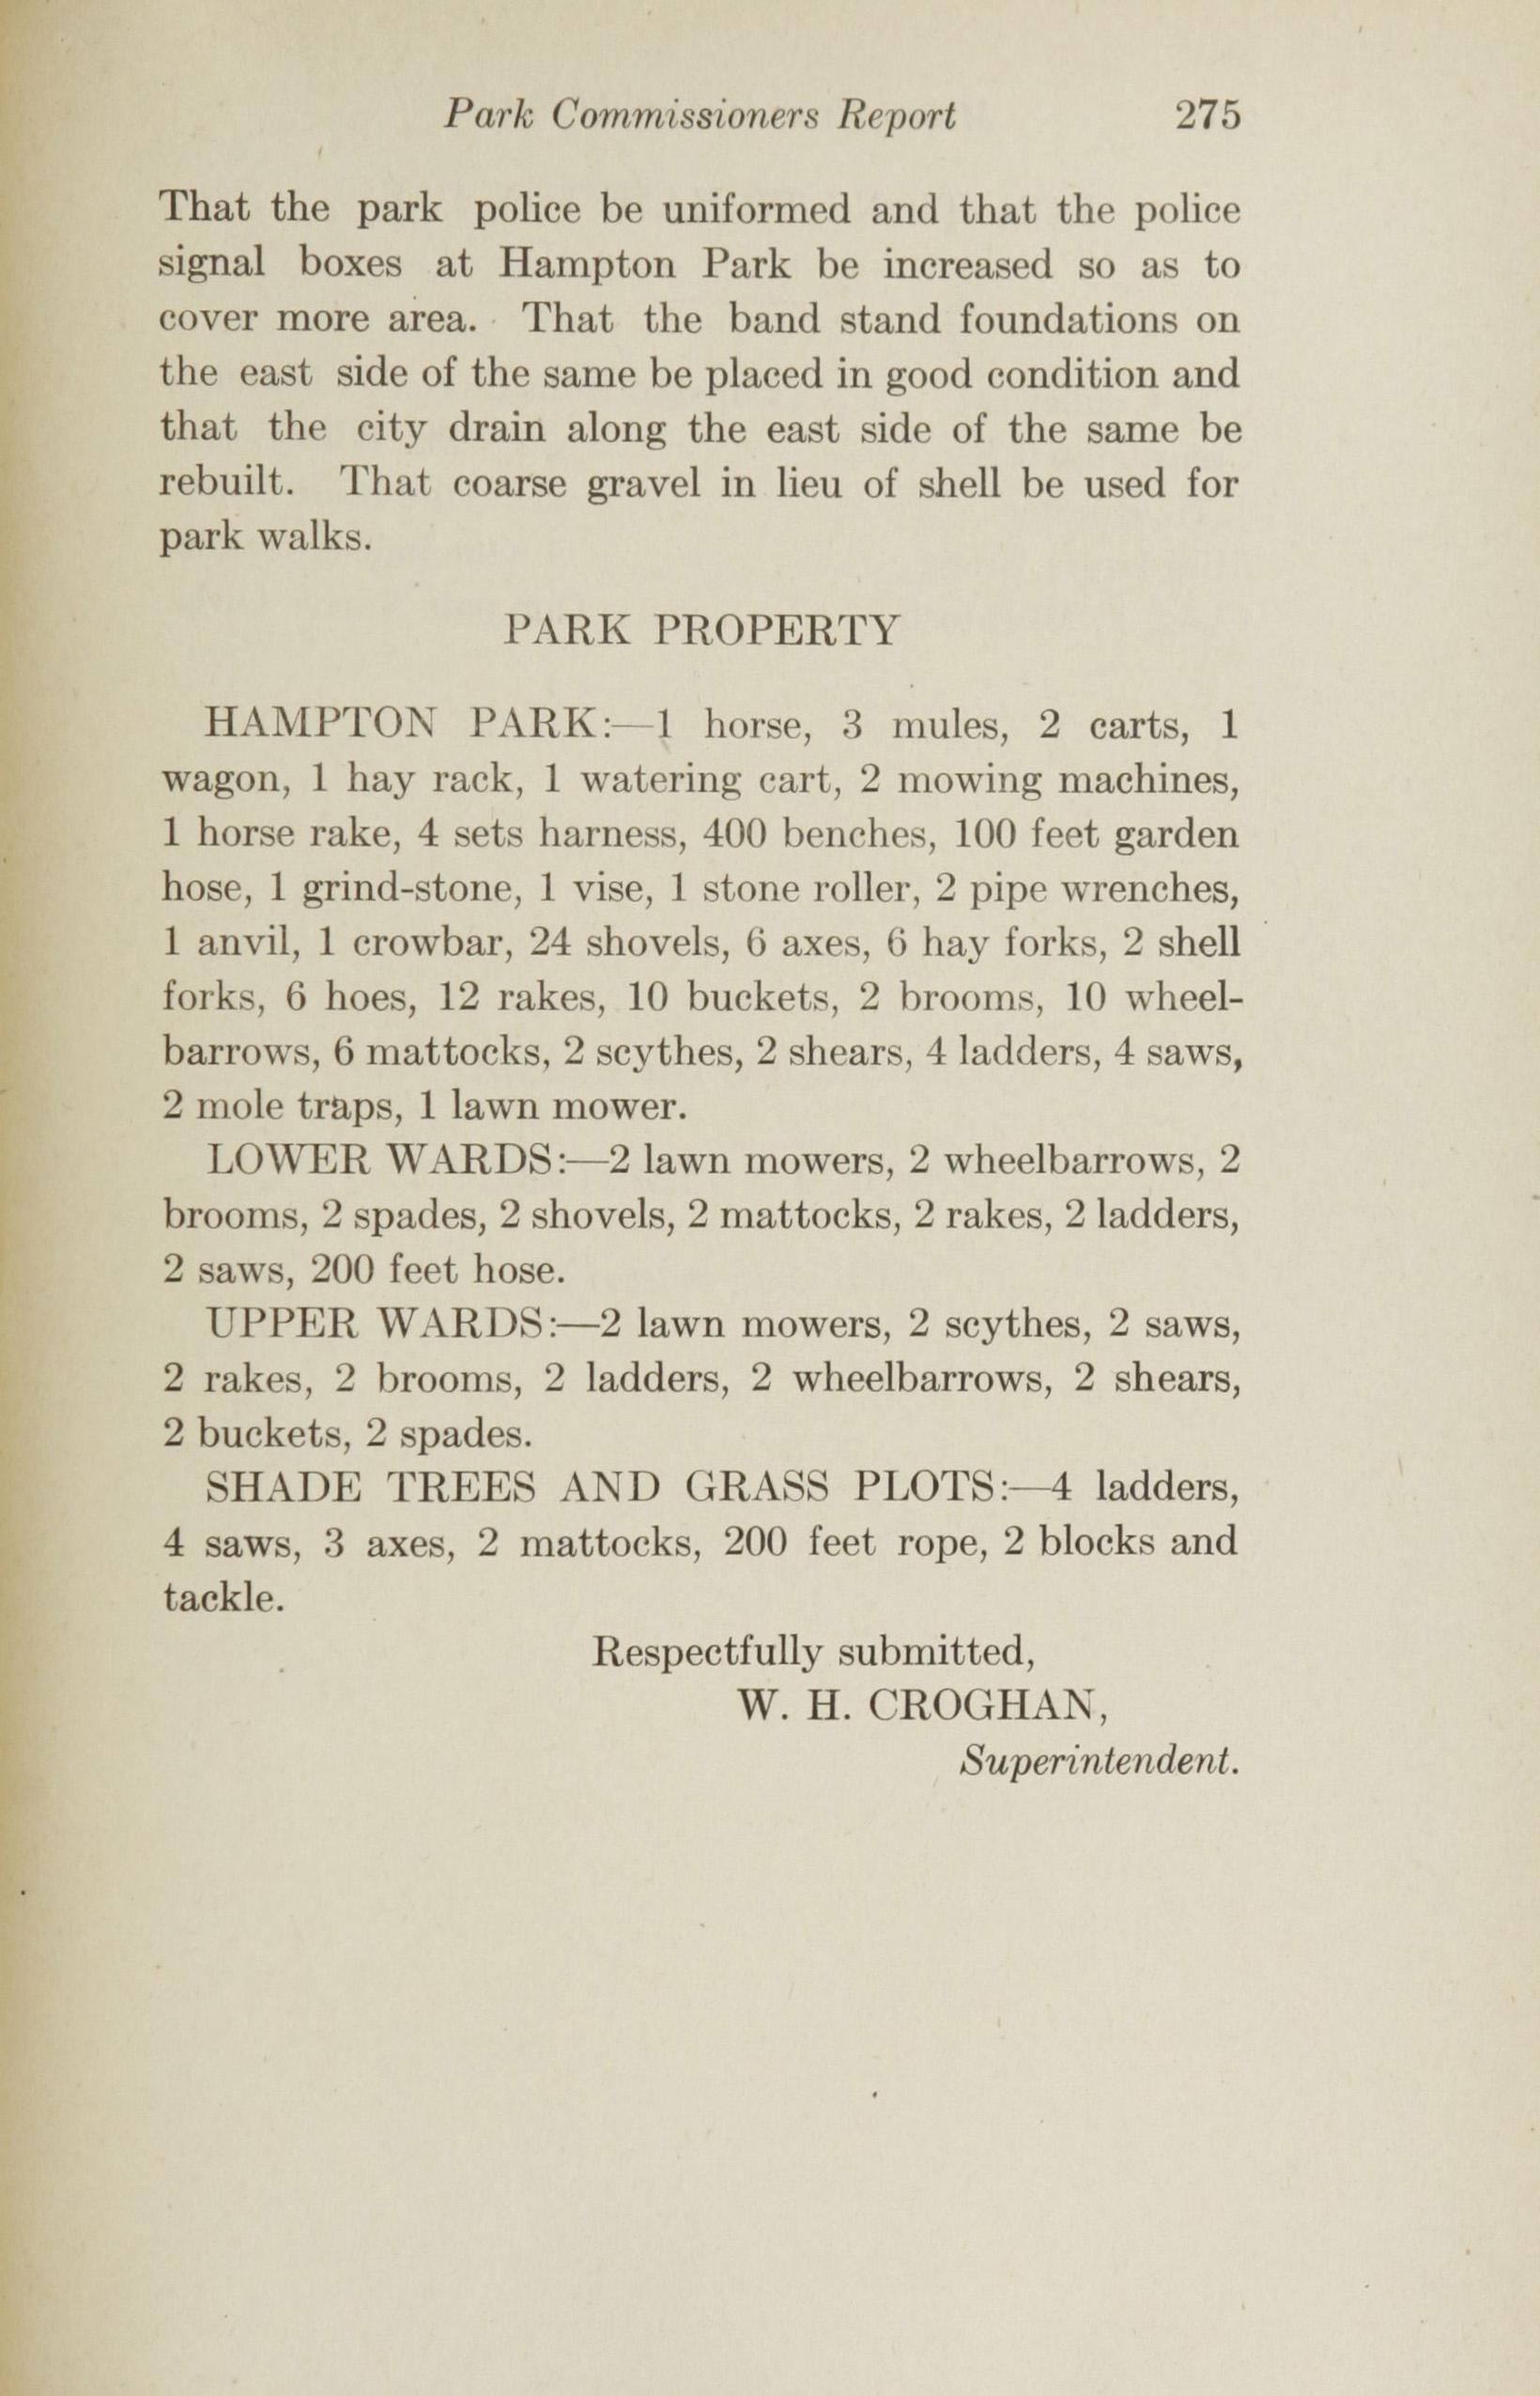 Charleston Yearbook, 1915, page 275